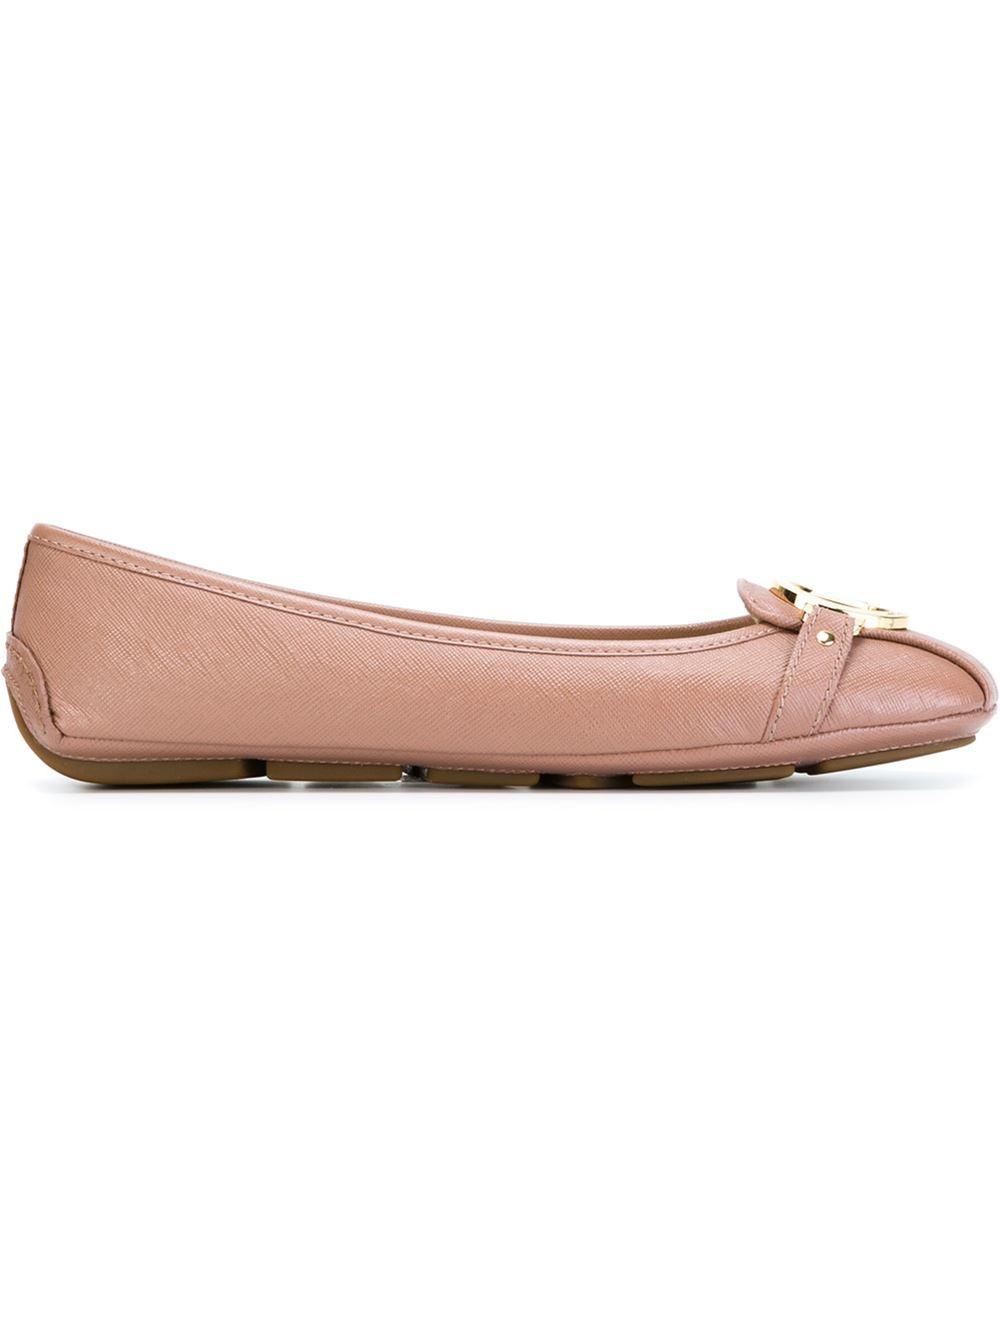 lyst michael michael kors fulton leather ballet flats in pink. Black Bedroom Furniture Sets. Home Design Ideas